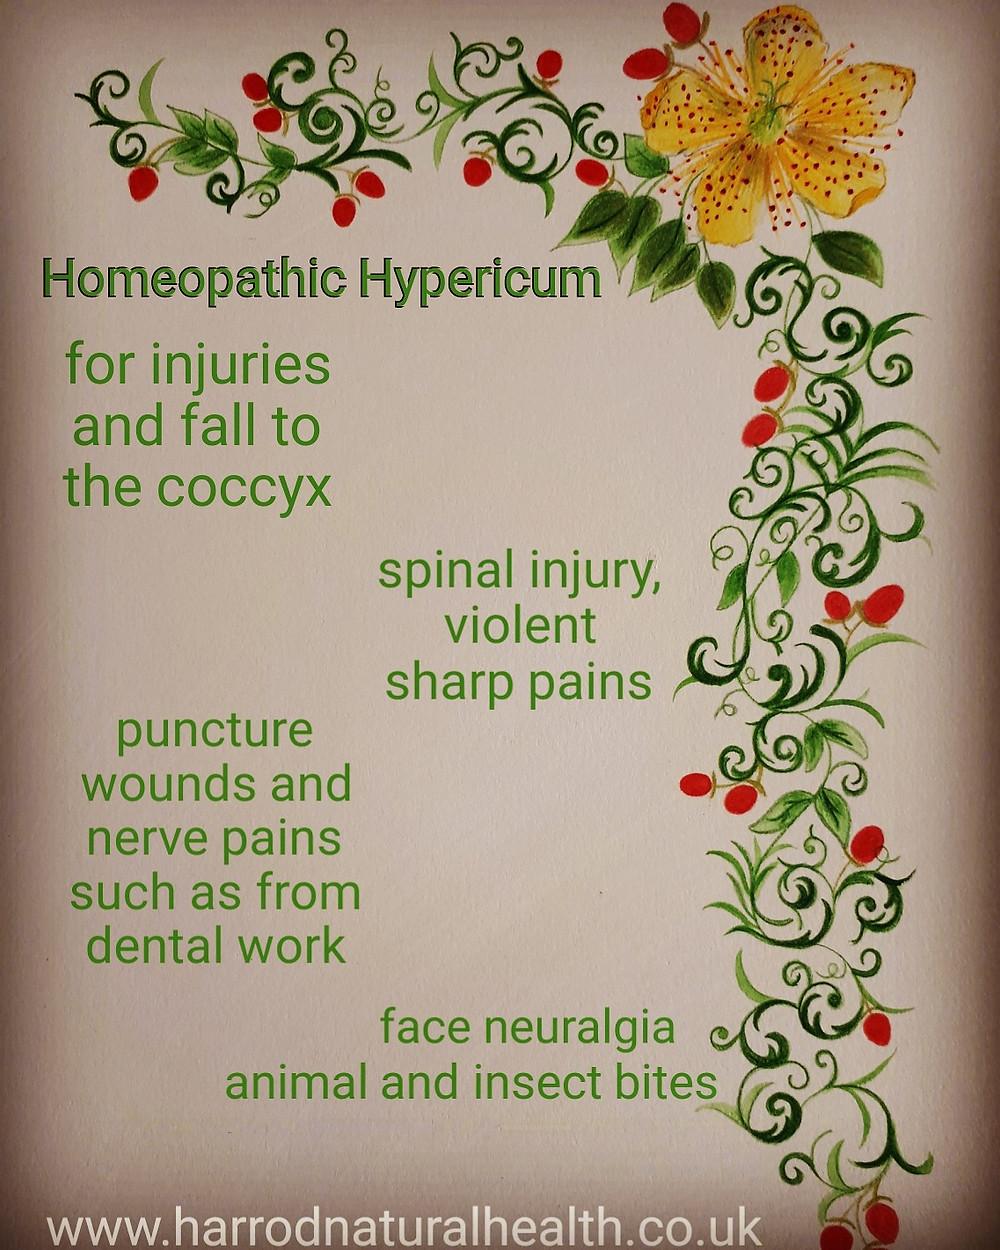 Homeopathic Hypericum